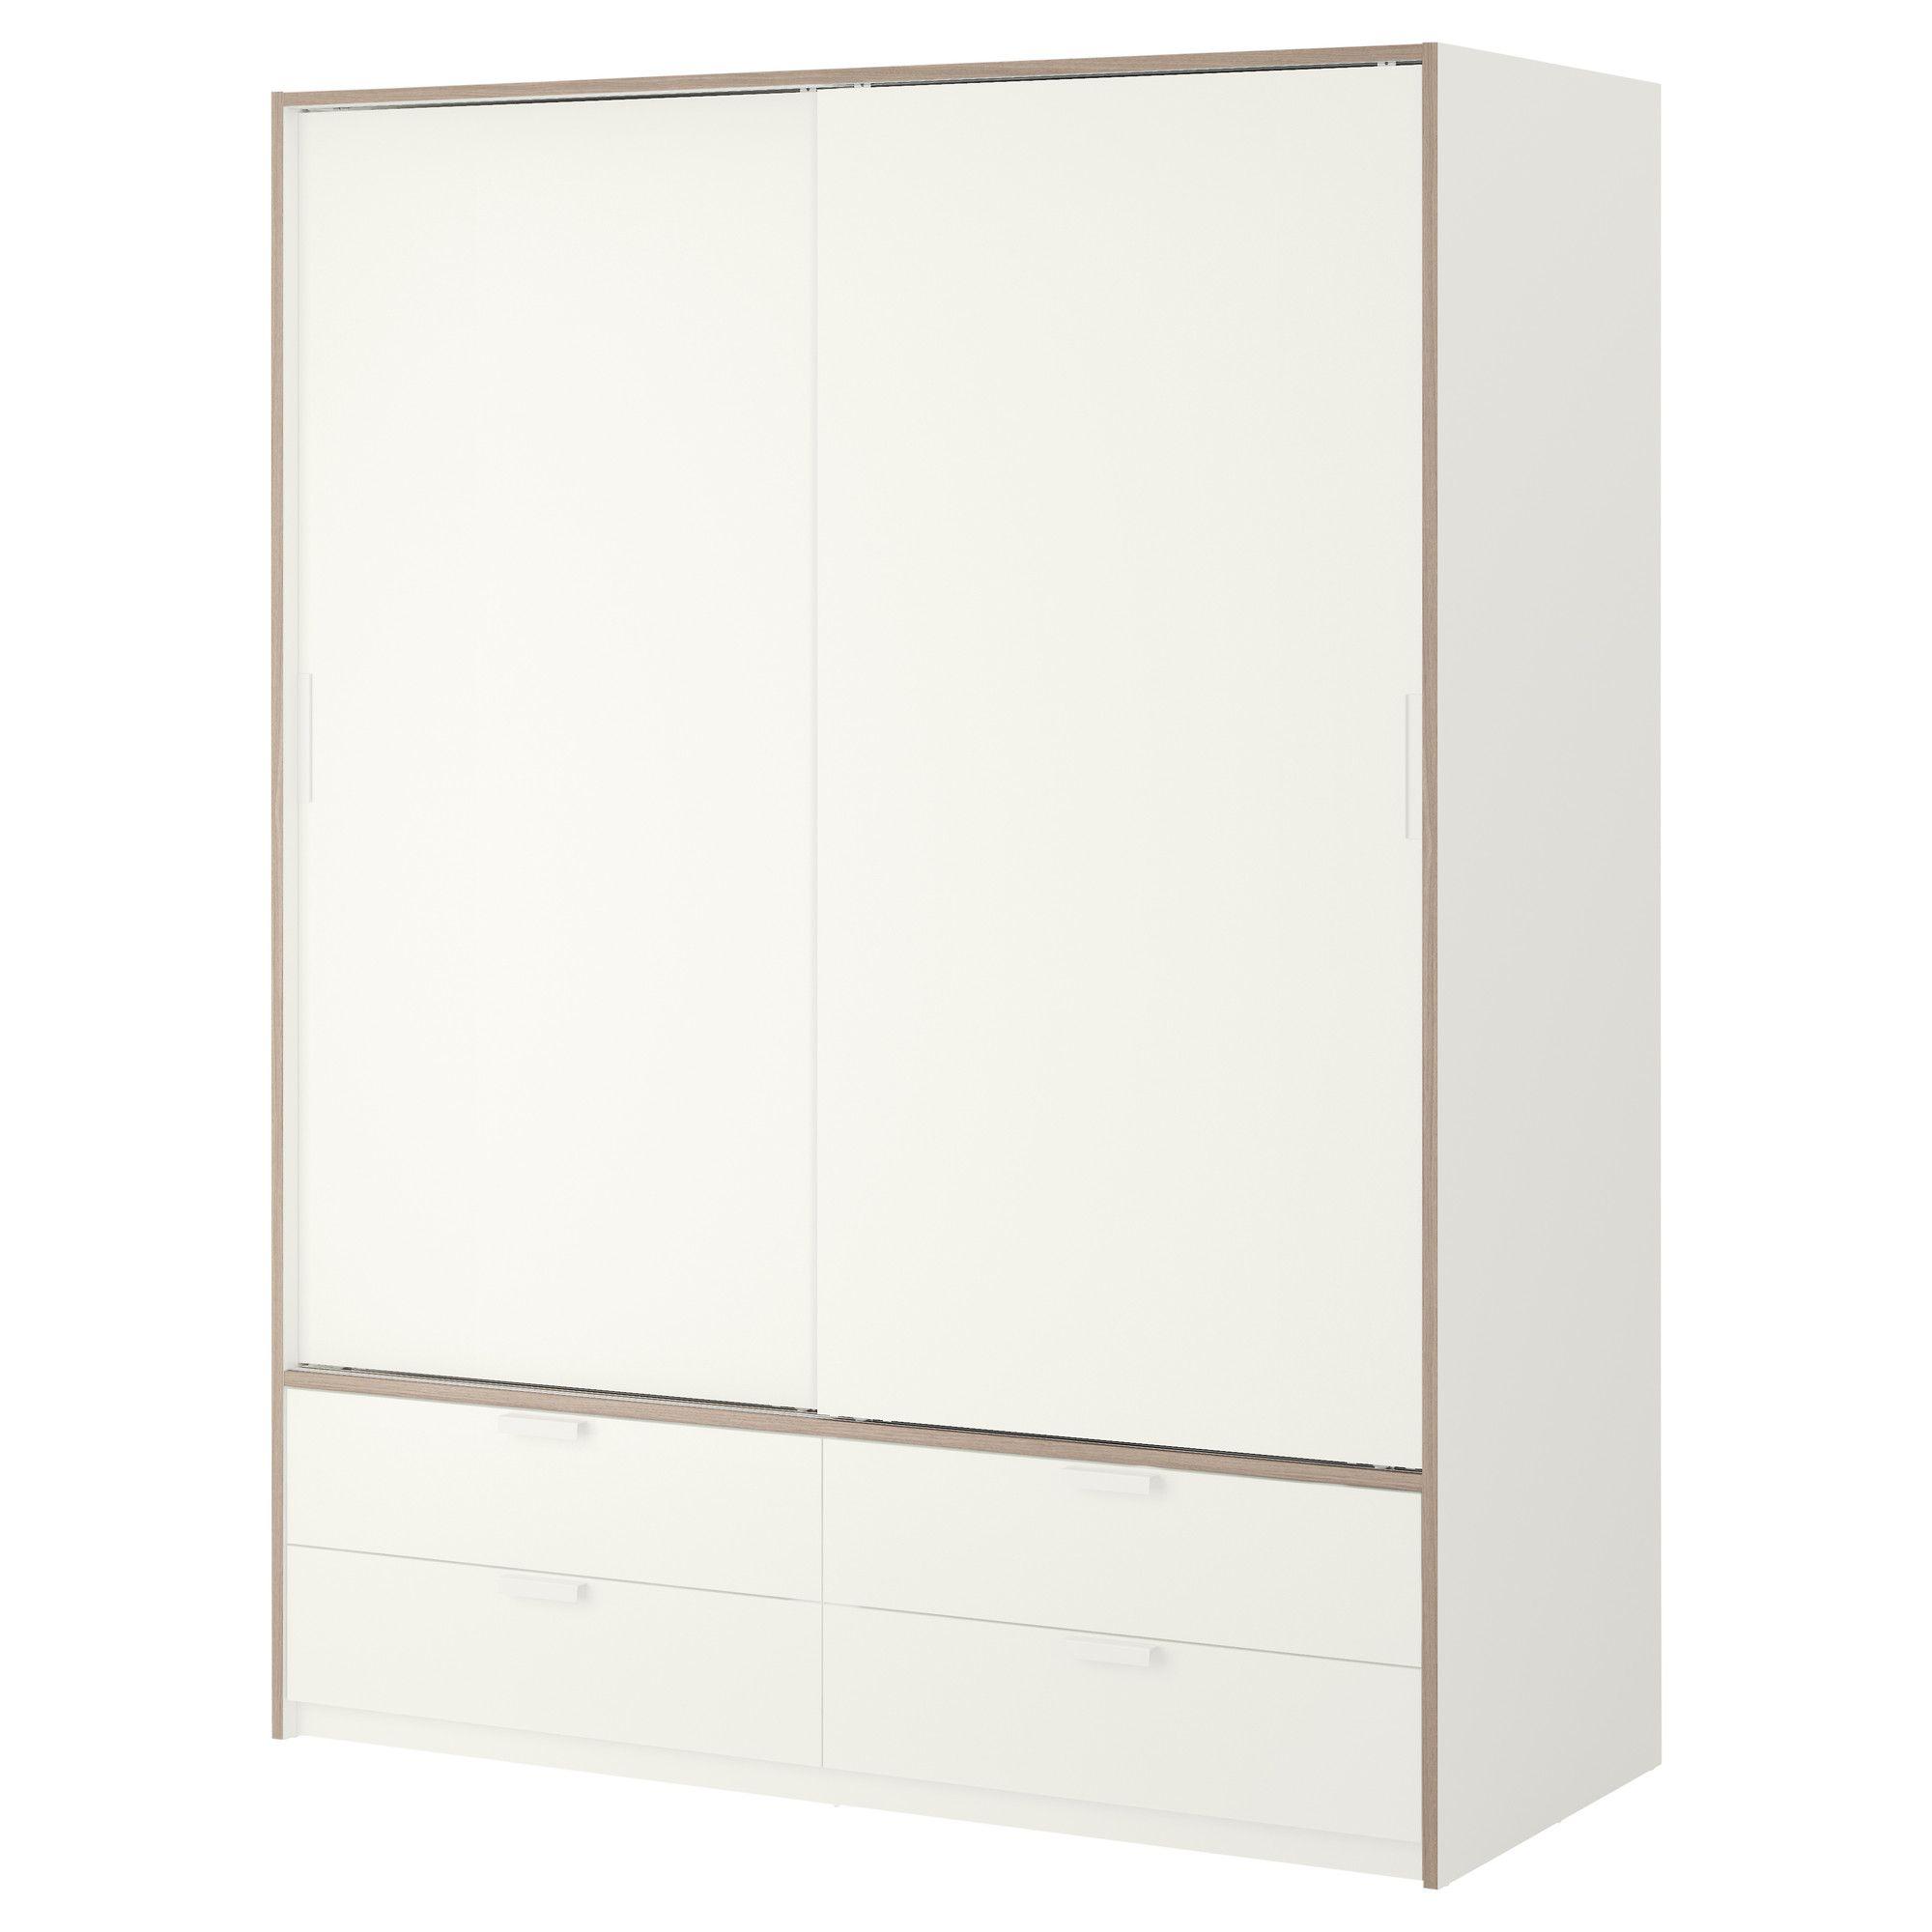 trysil wardrobe w sliding doors 4 drawers white light. Black Bedroom Furniture Sets. Home Design Ideas